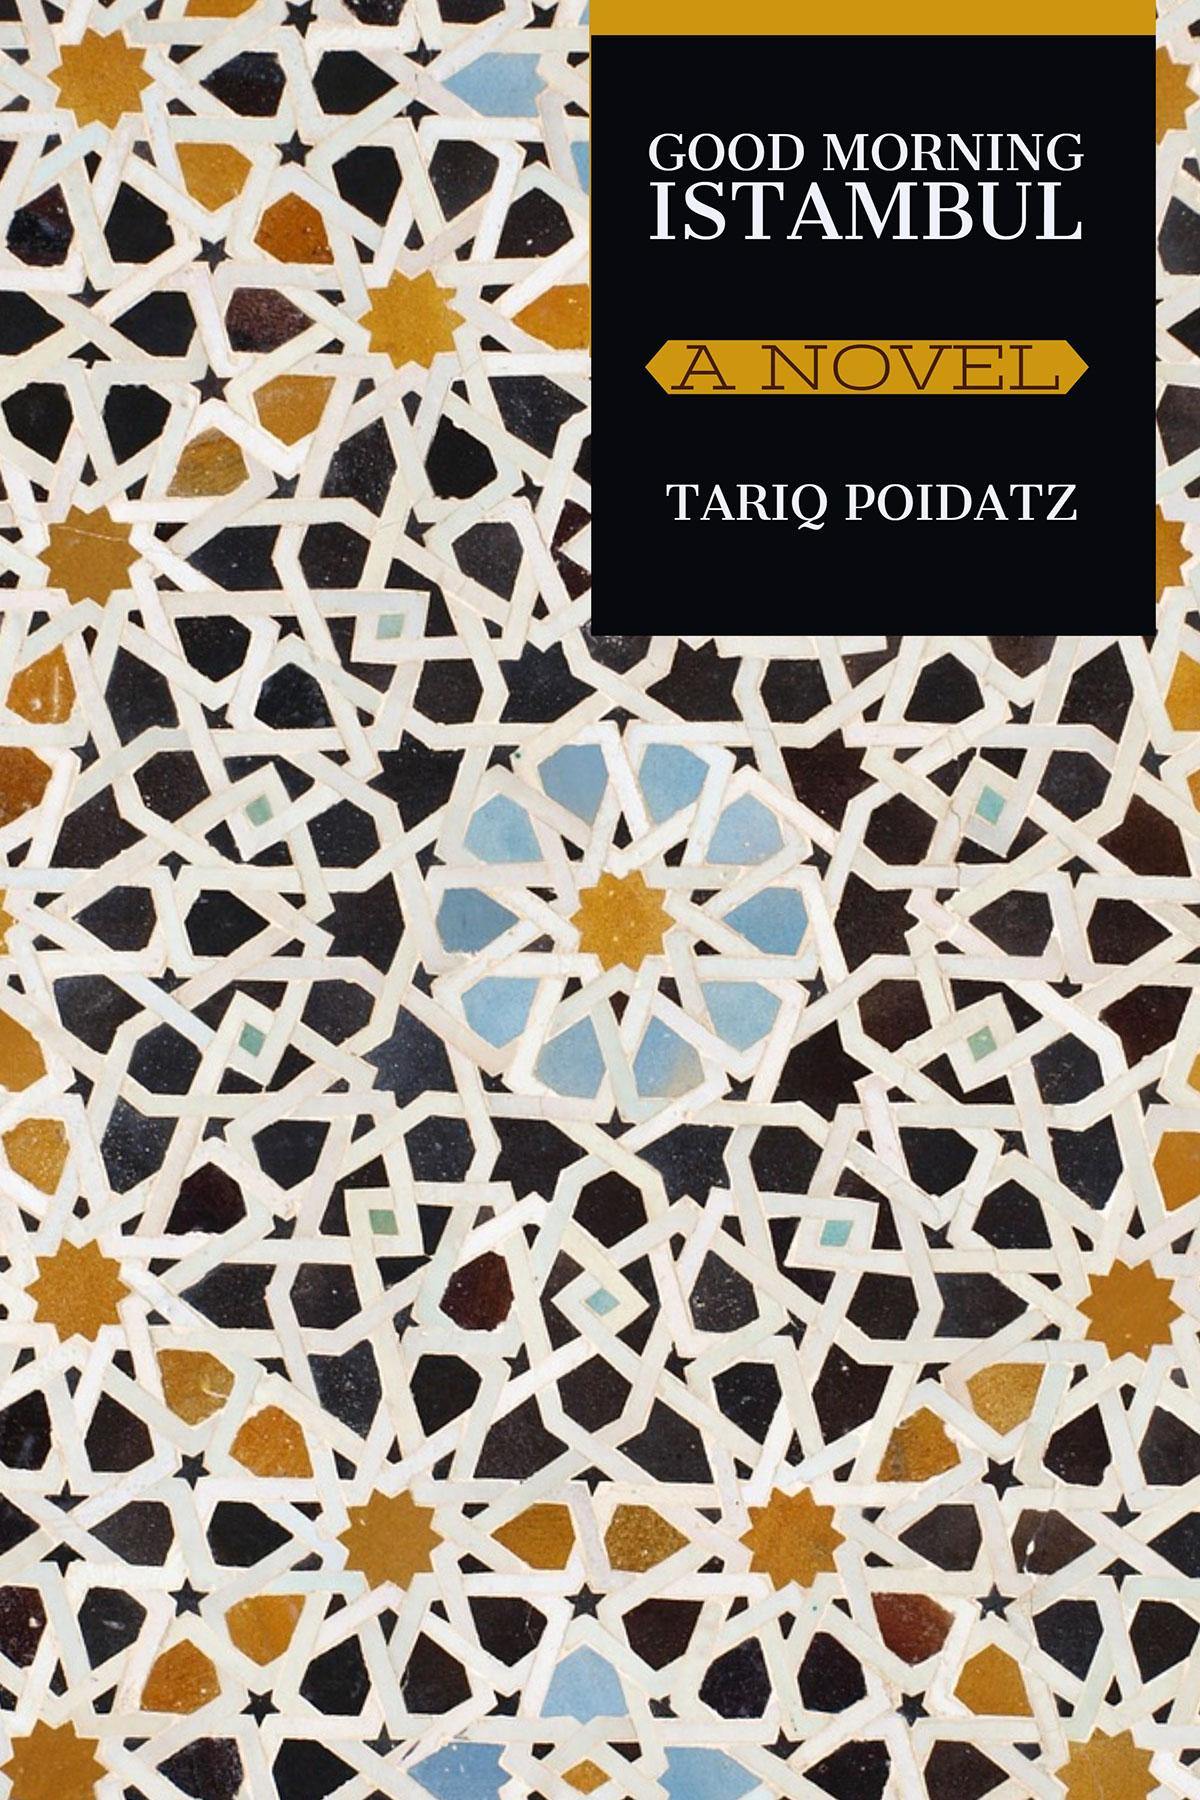 ..... ..... ... Good Morning Istambul Tariq Poidatz a novel The Arab Awakening The Arab Awakening